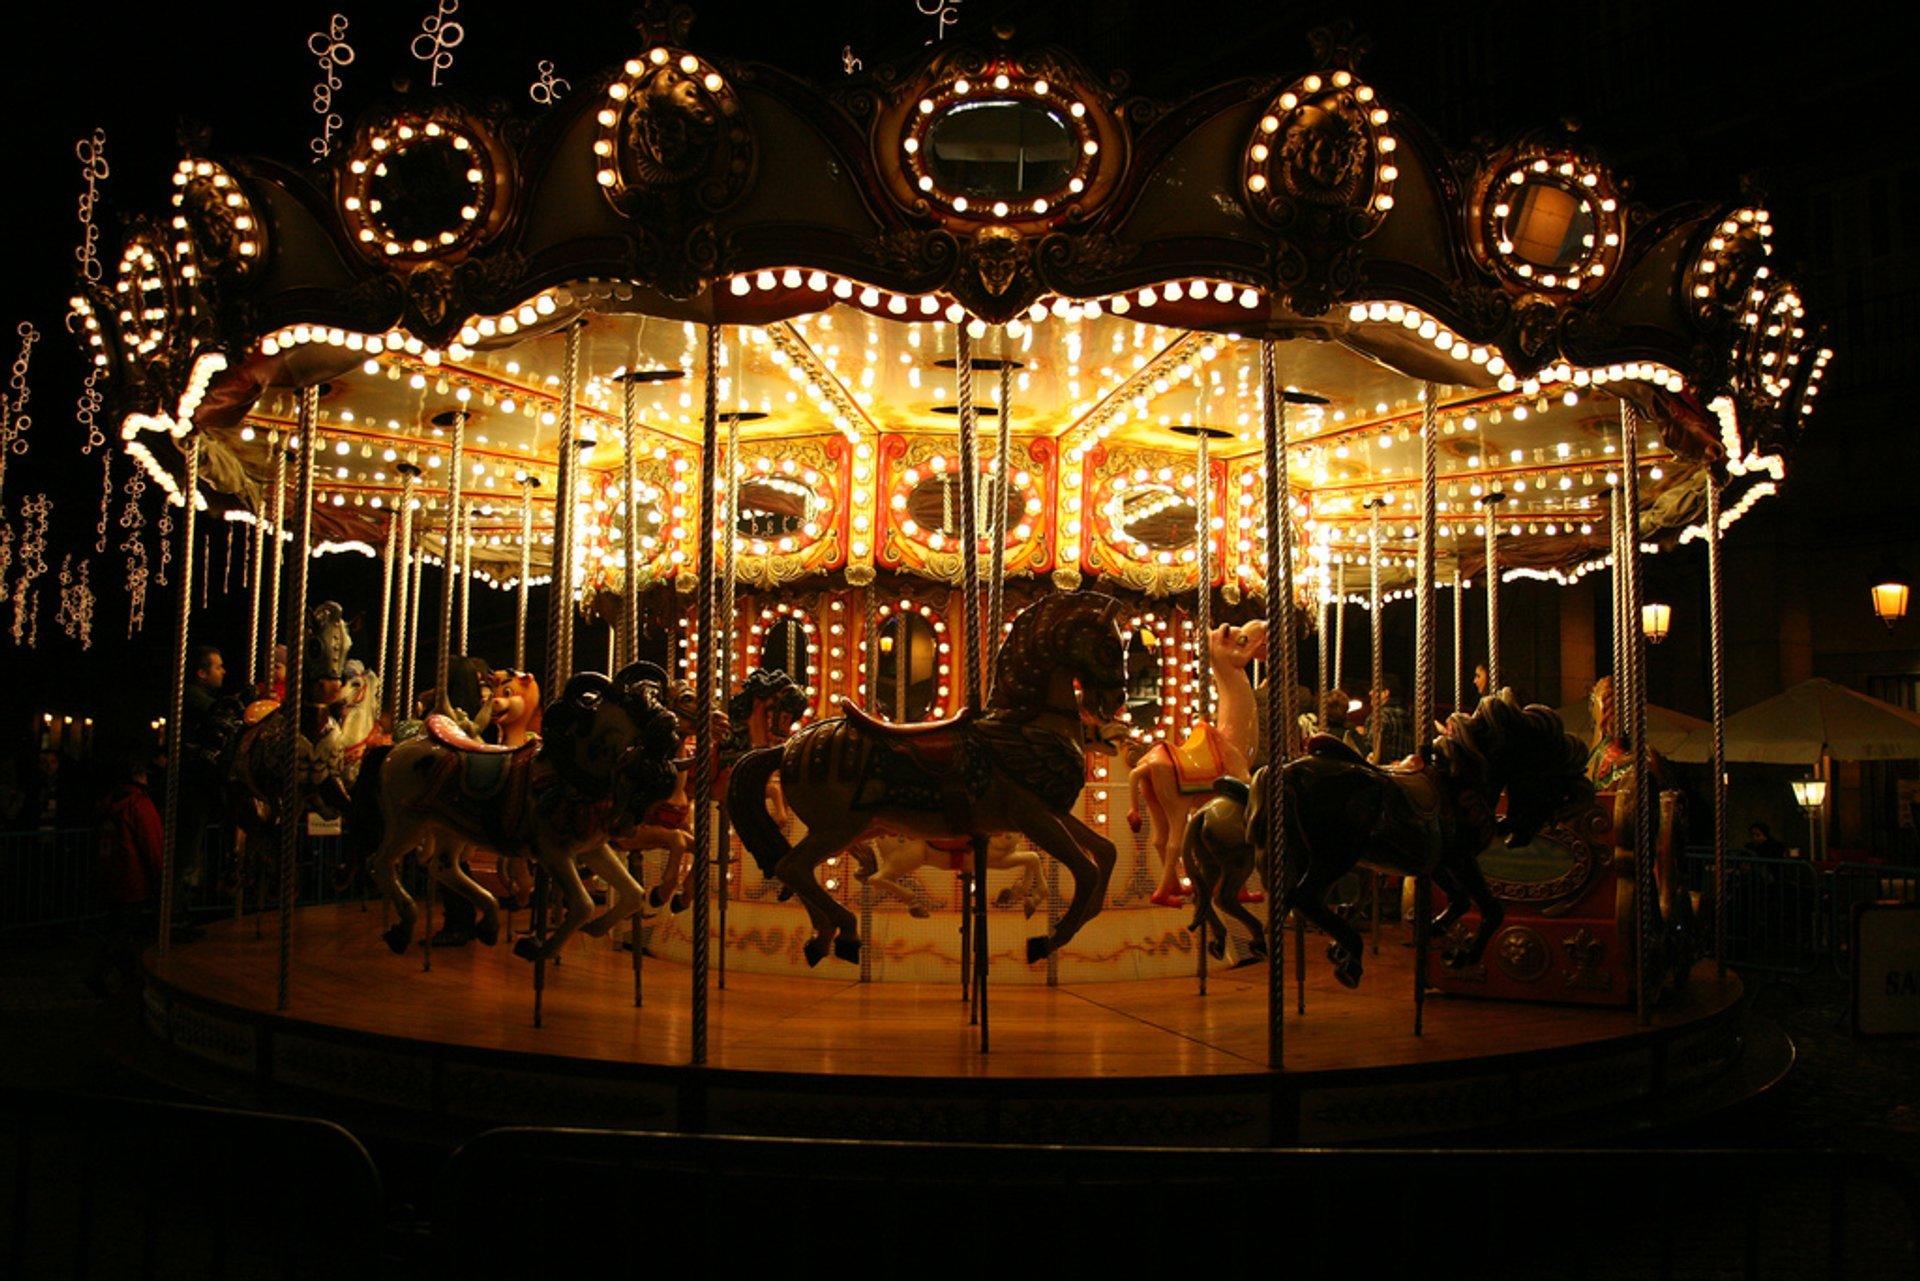 Carousel at Plaza de Santa Cruz 2020